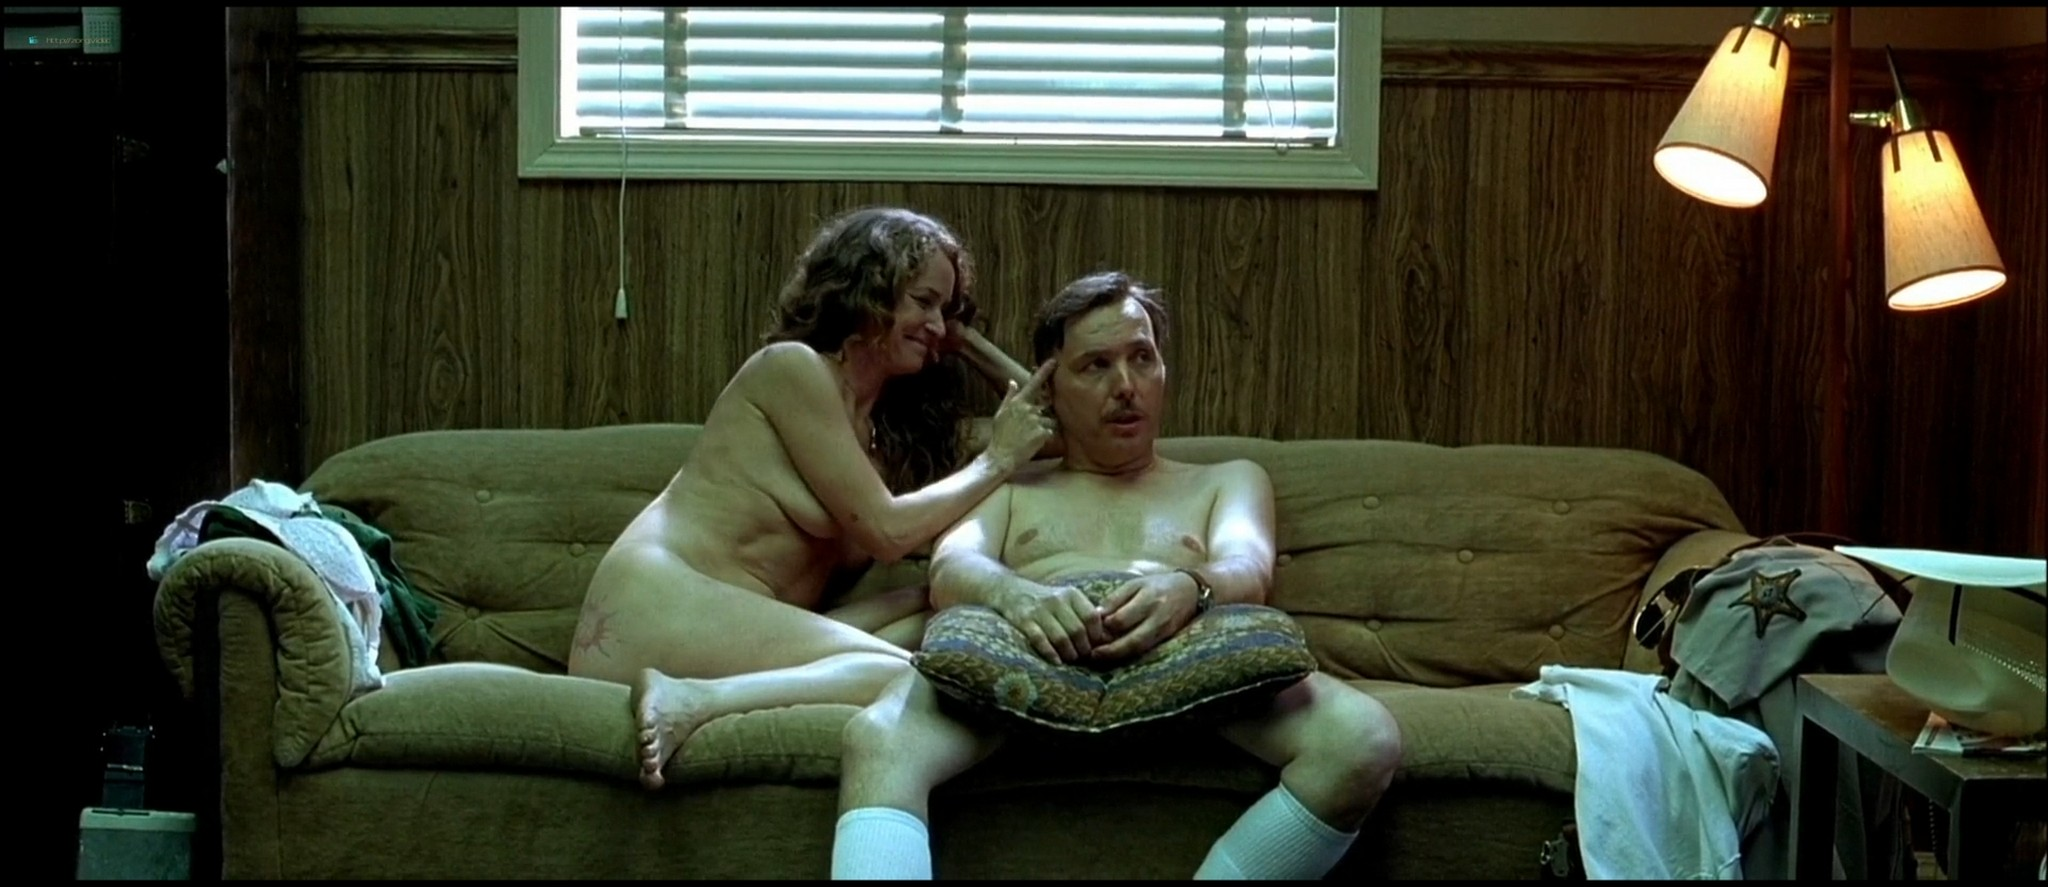 January Jones sex doggy style and Melissa Leo naked - The Three Burials of Melquiades Estrada HD 1080p BluRay (1)